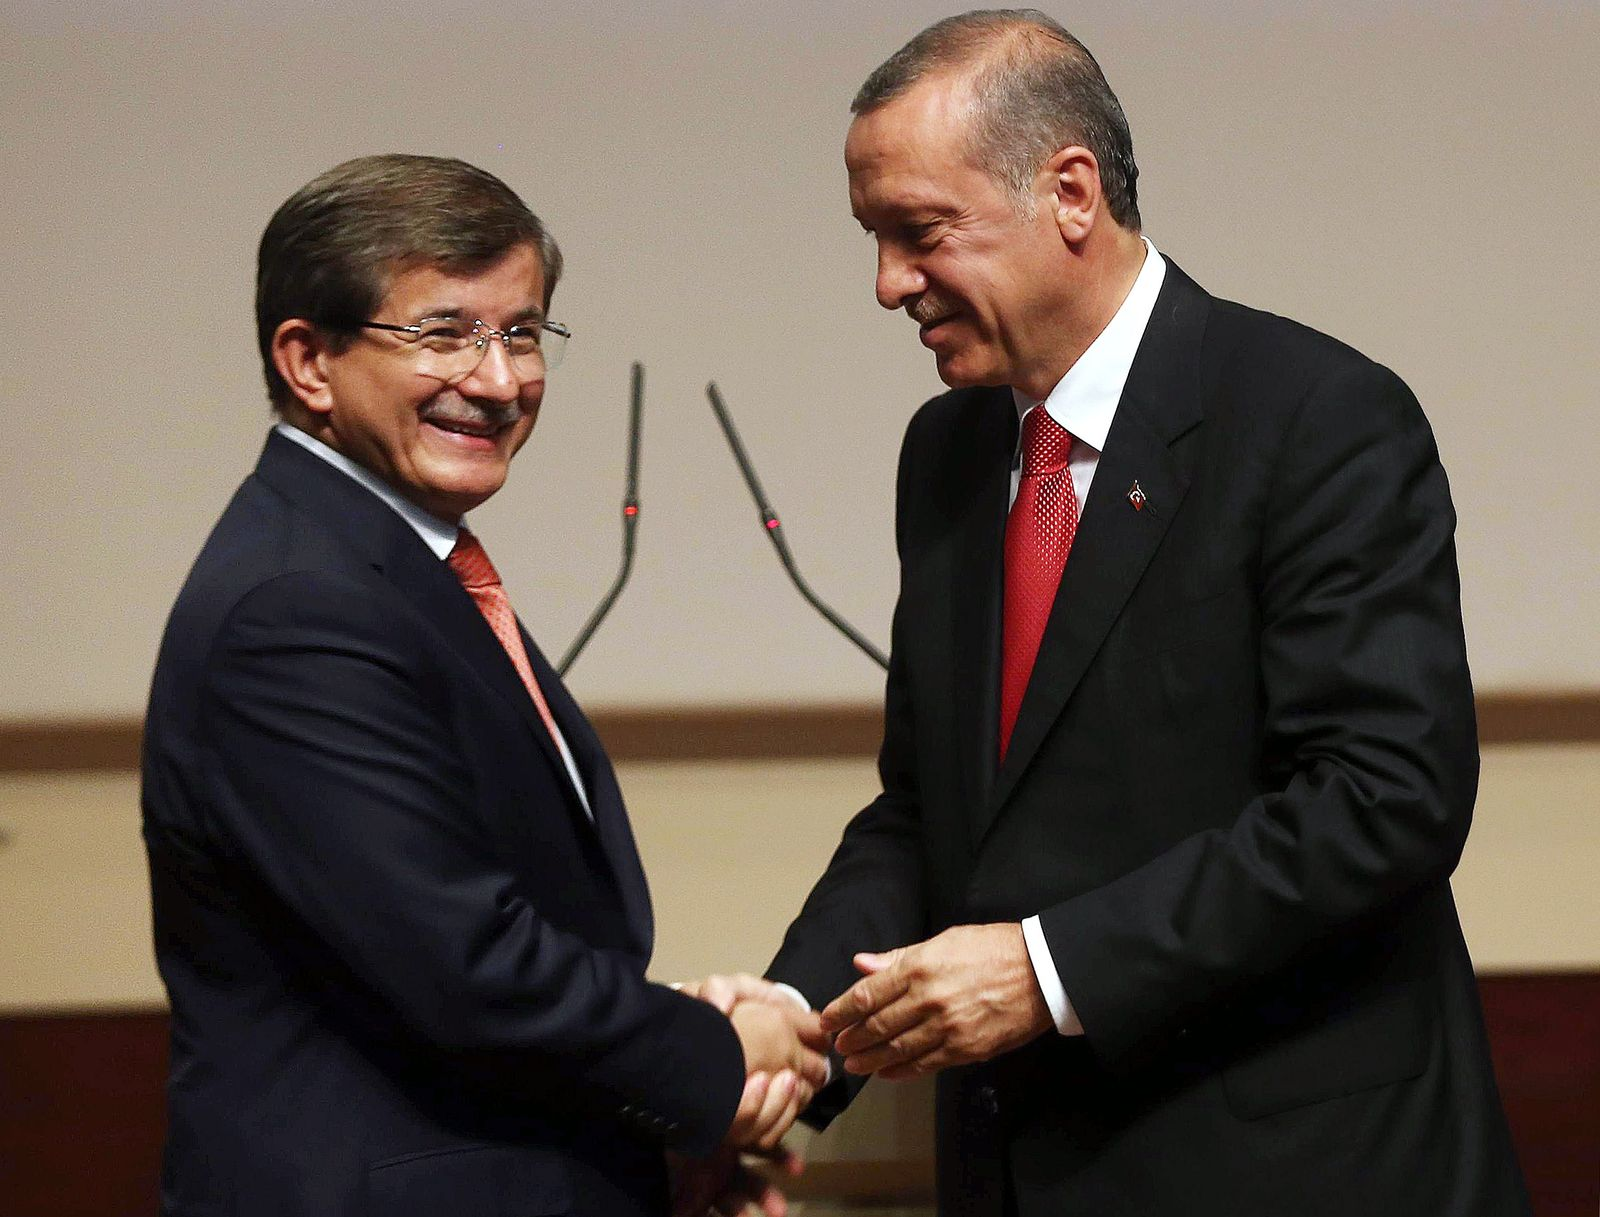 TURKEY-POLITICS-ERDOGAN-DAVUTOGLU